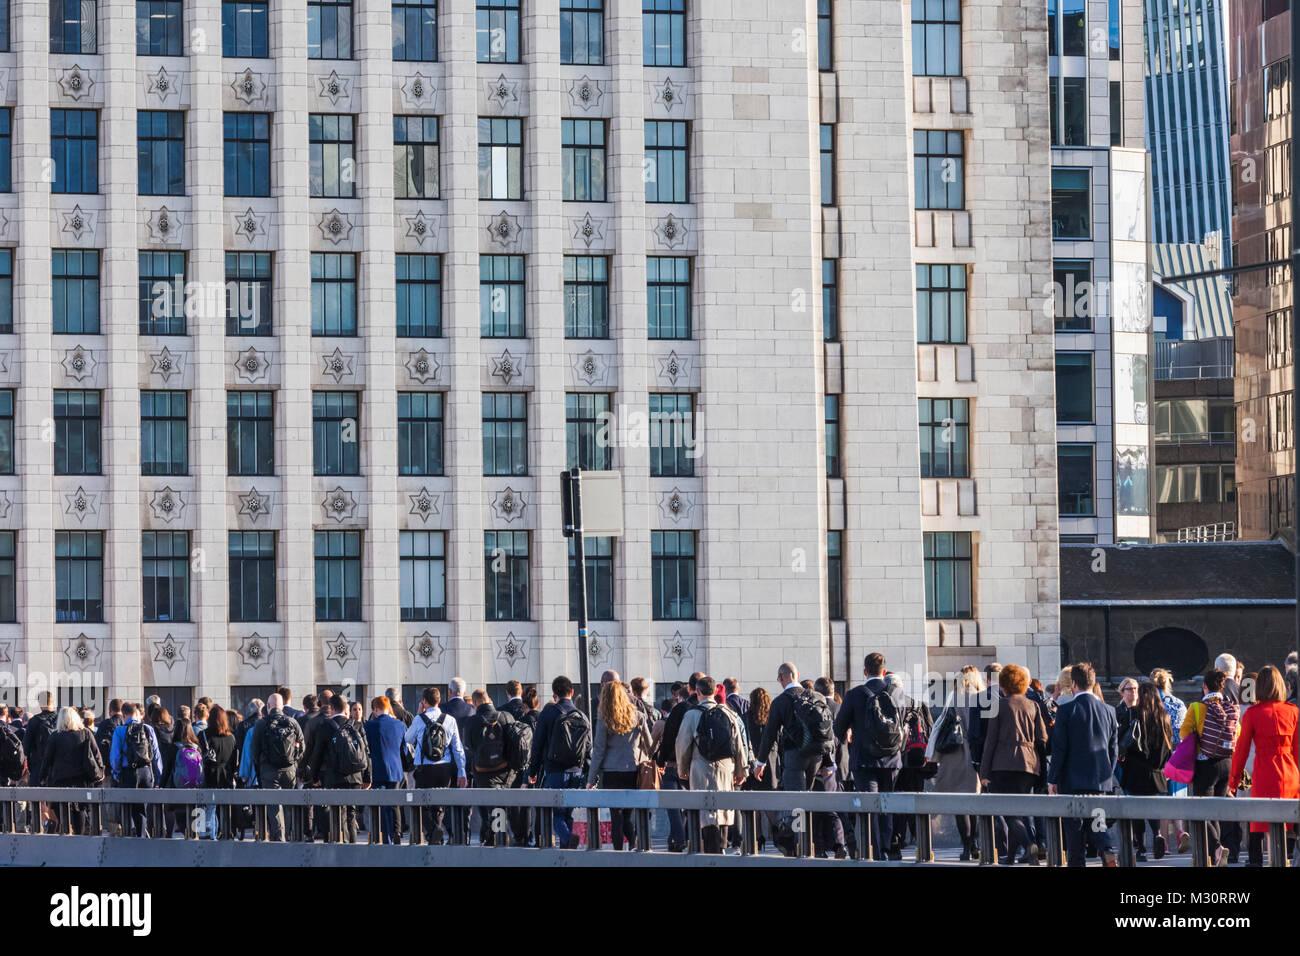 England, London, London Bridge, Commuters Heading to The City of London - Stock Image